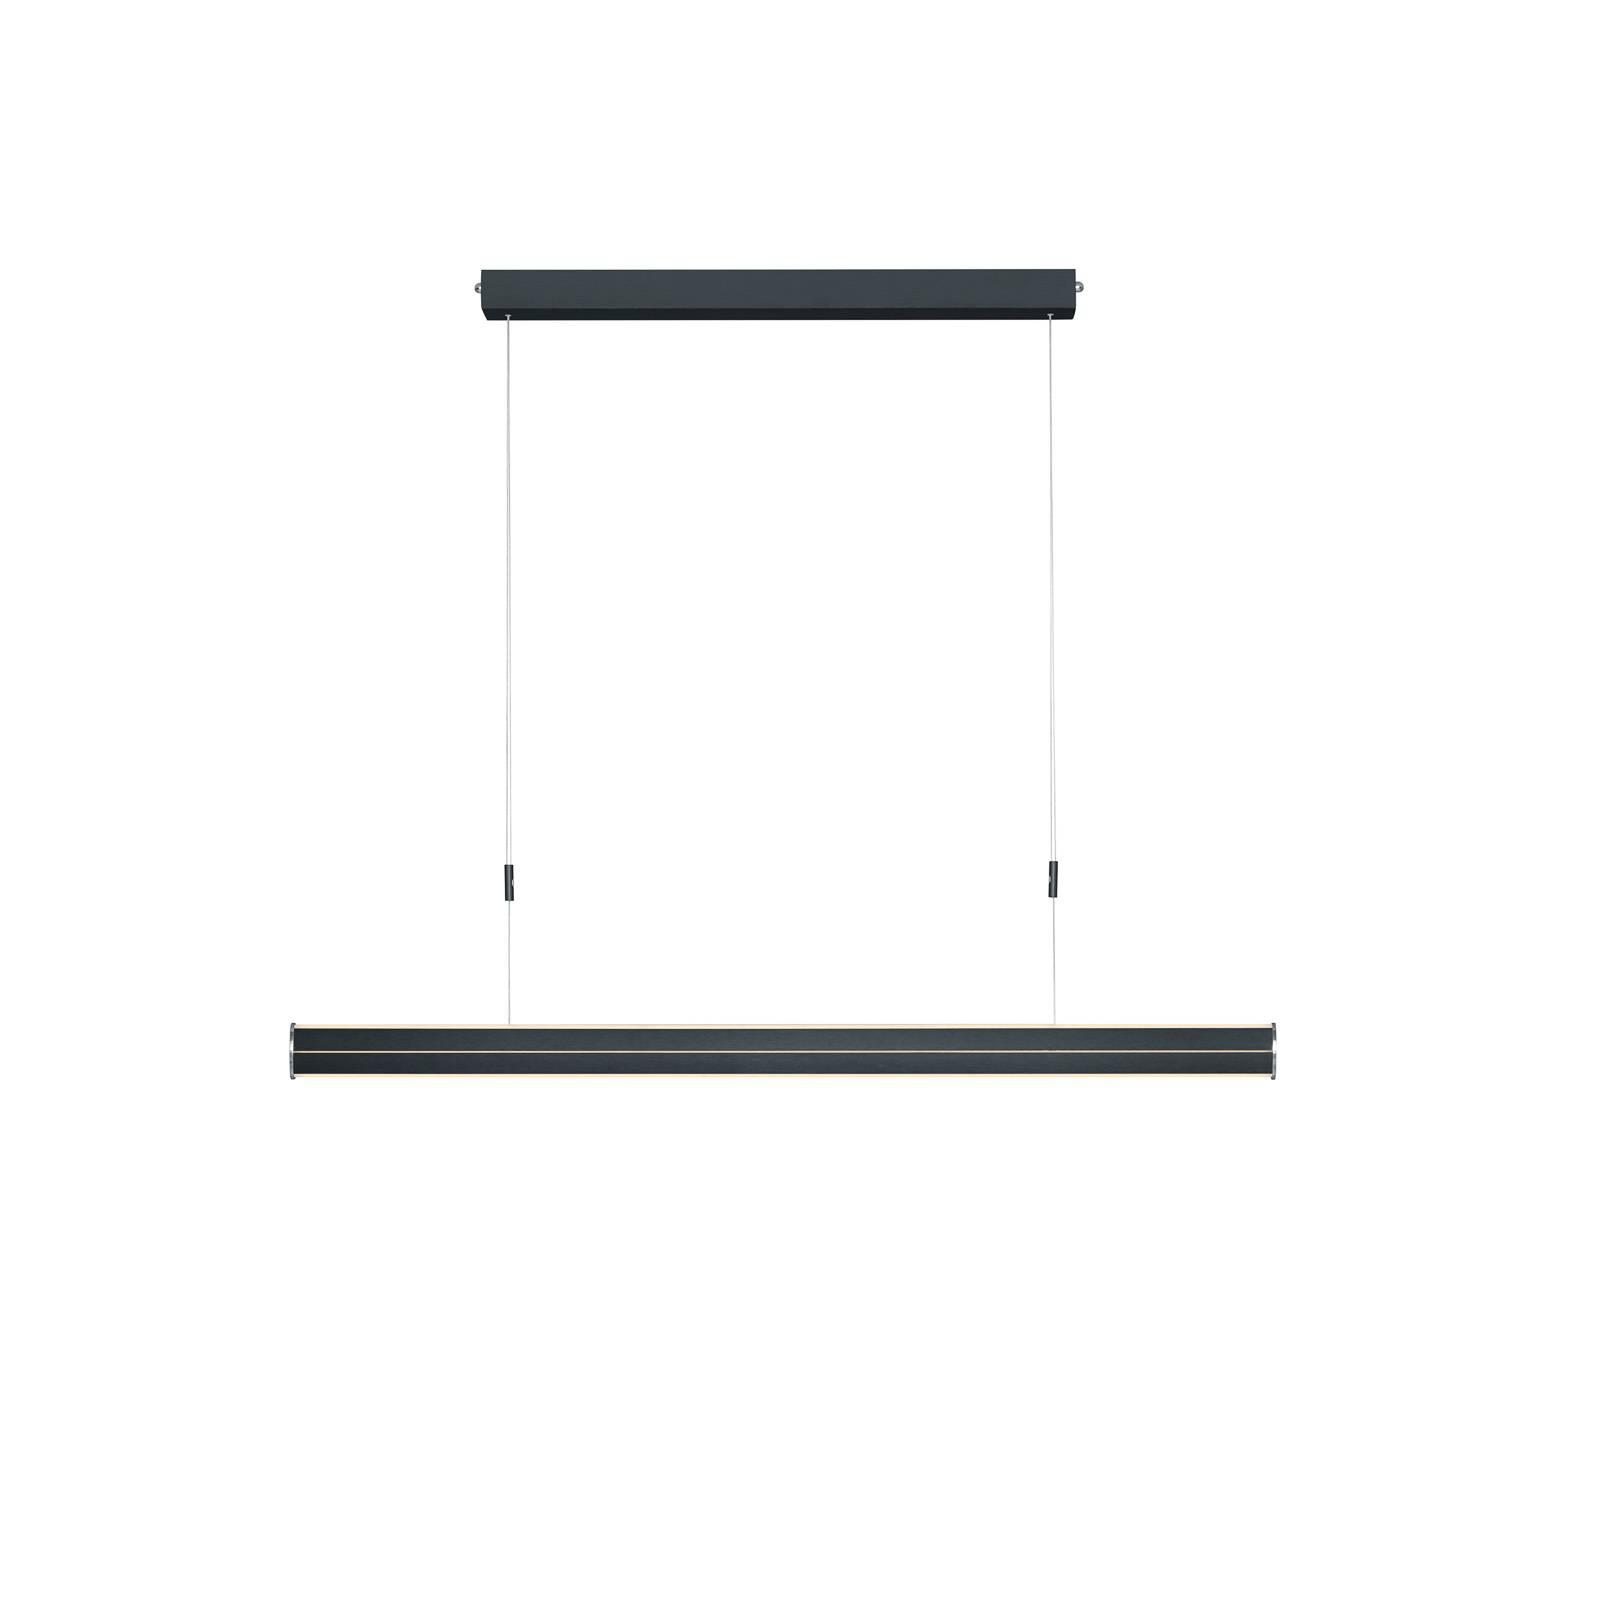 BANKAMP Pure F LED hanglamp ZigBee dimb. antraciet